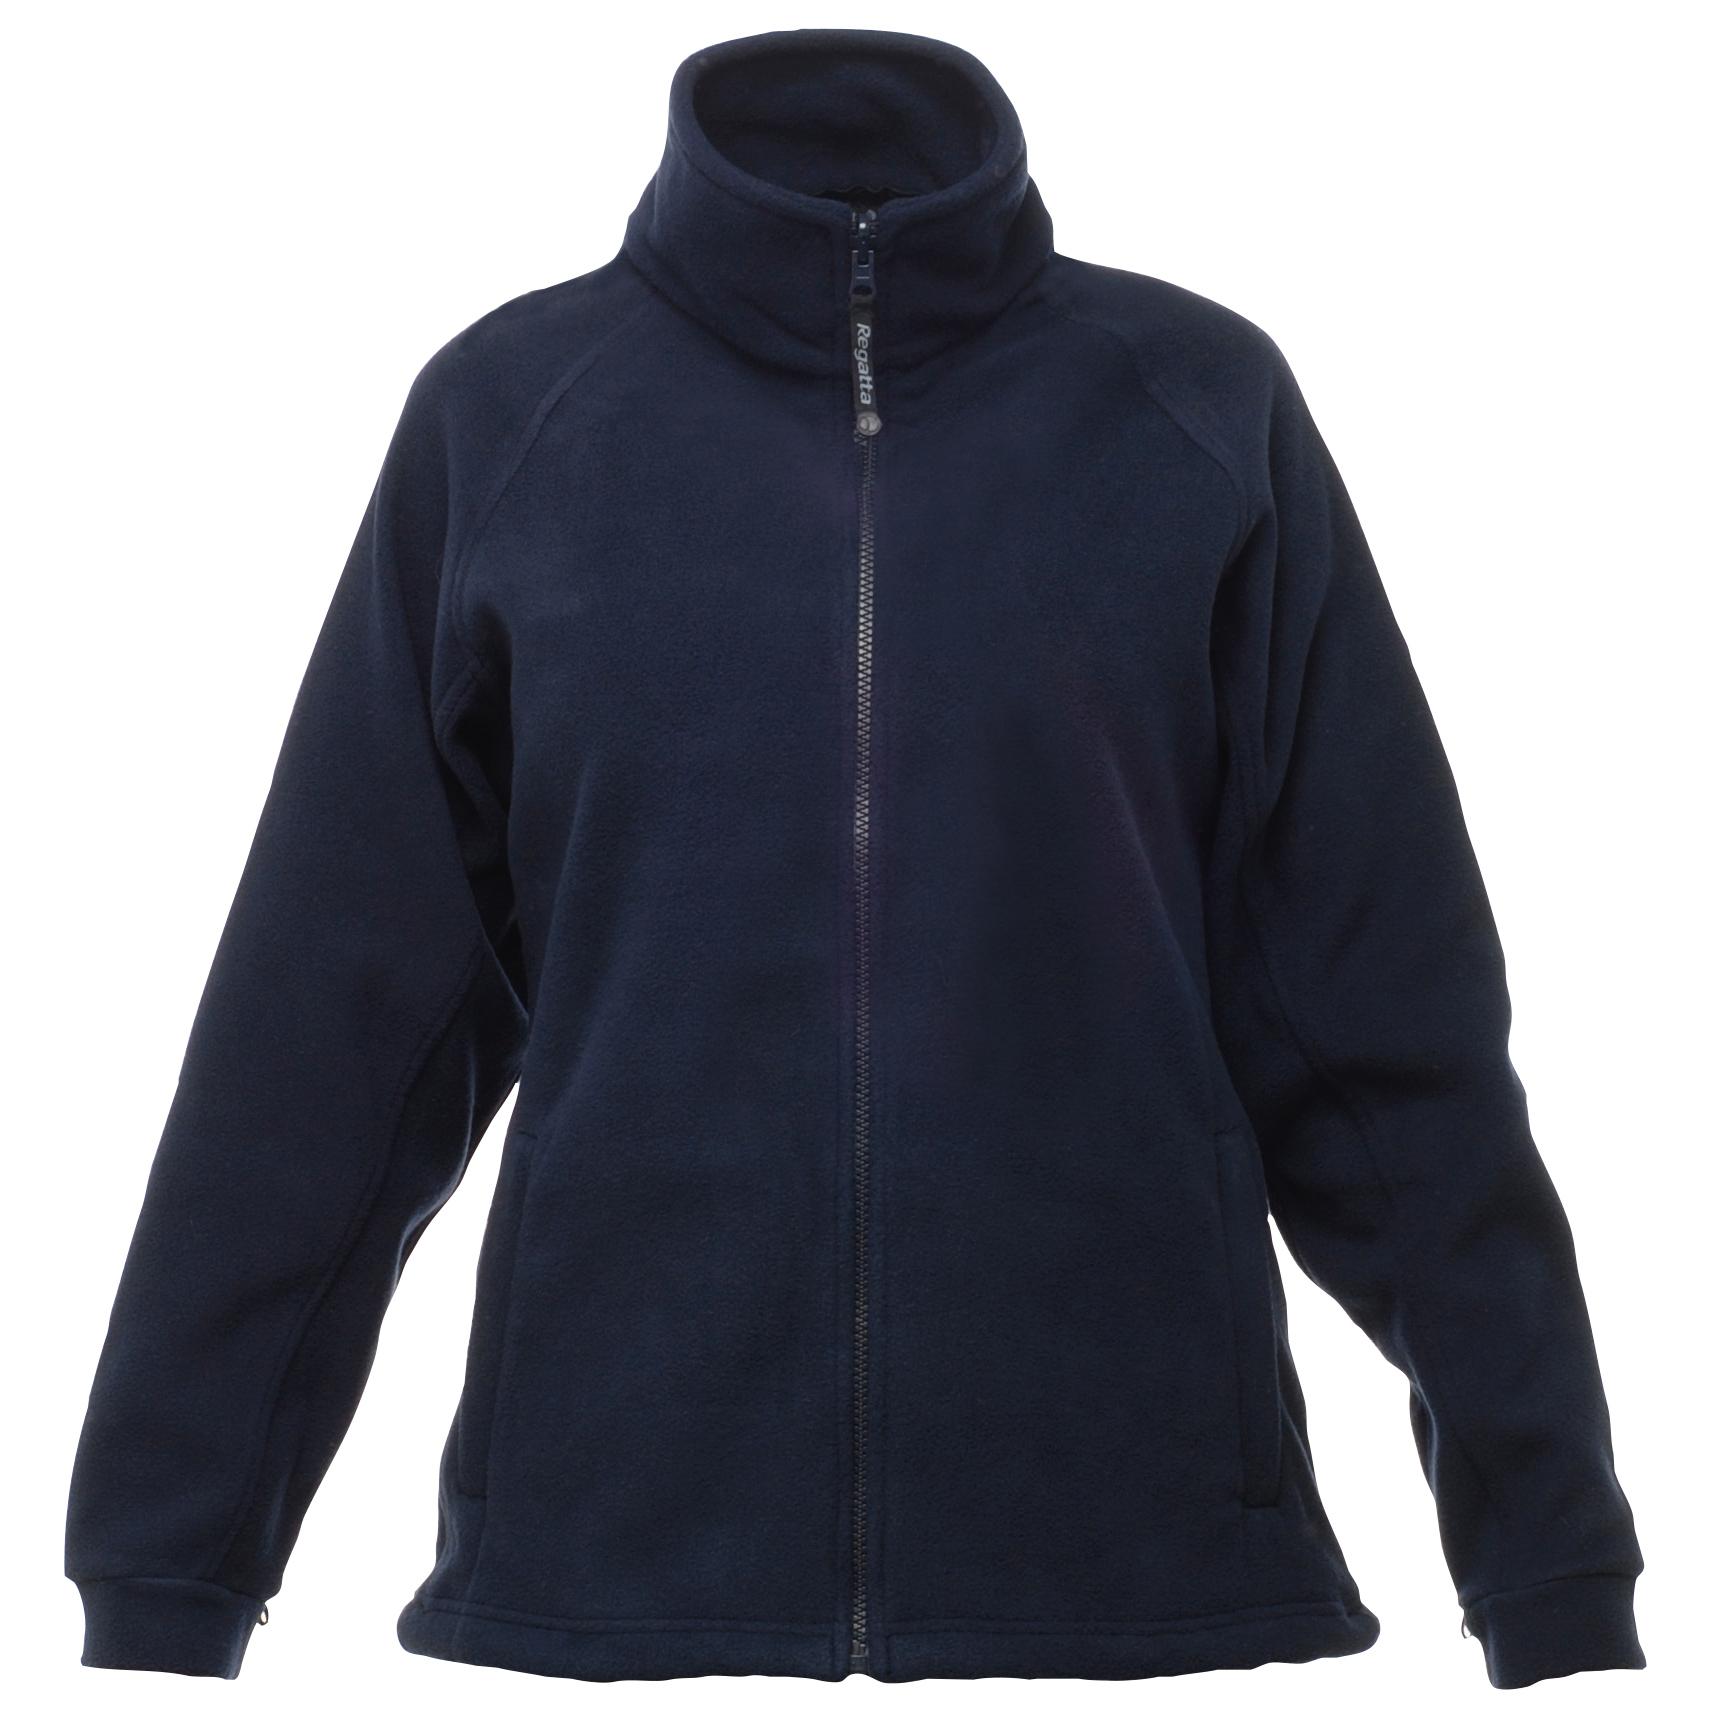 Regatta Womens/Ladies Thor III Anti-Pill Fleece Jacket (12) (Dark Navy)